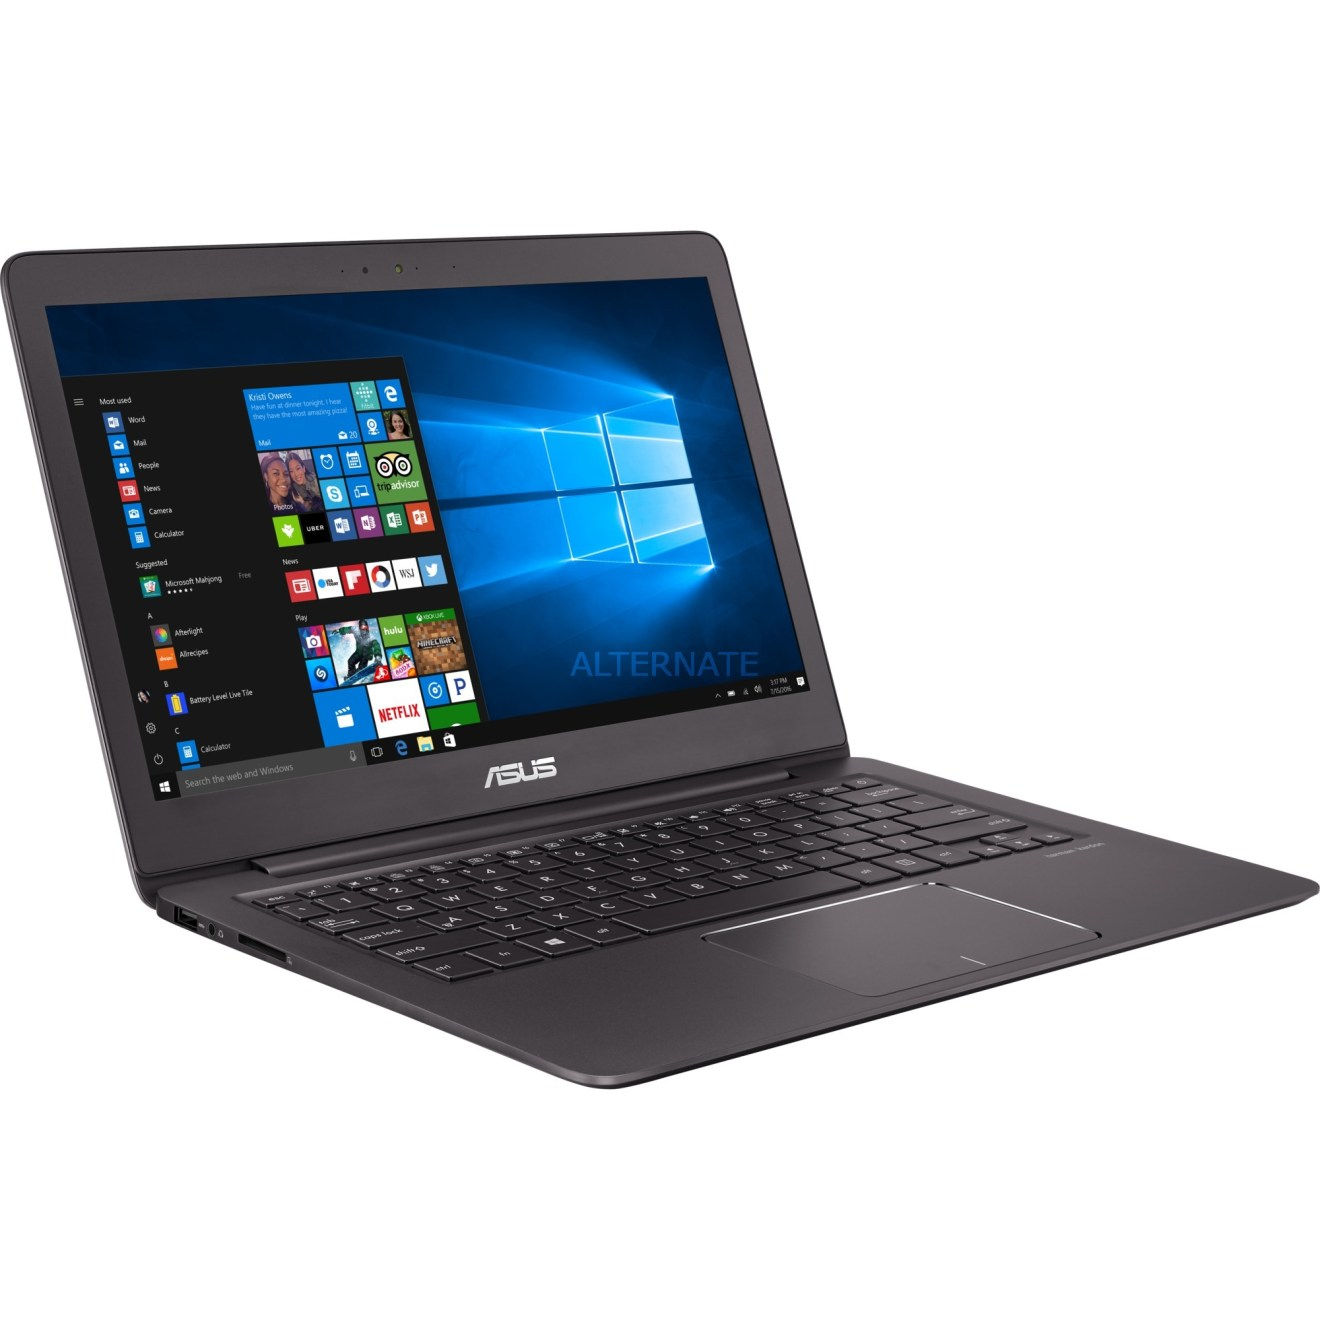 Zenbook UX330UA-FC118T, Notebook asus zenbook 13.3-inch ultra-slim laptop ASUS ZenBook 13.3-inch Ultra-Slim Laptop ASUS Zenbook UX330UA FC118T  Notebook  pl4a5x